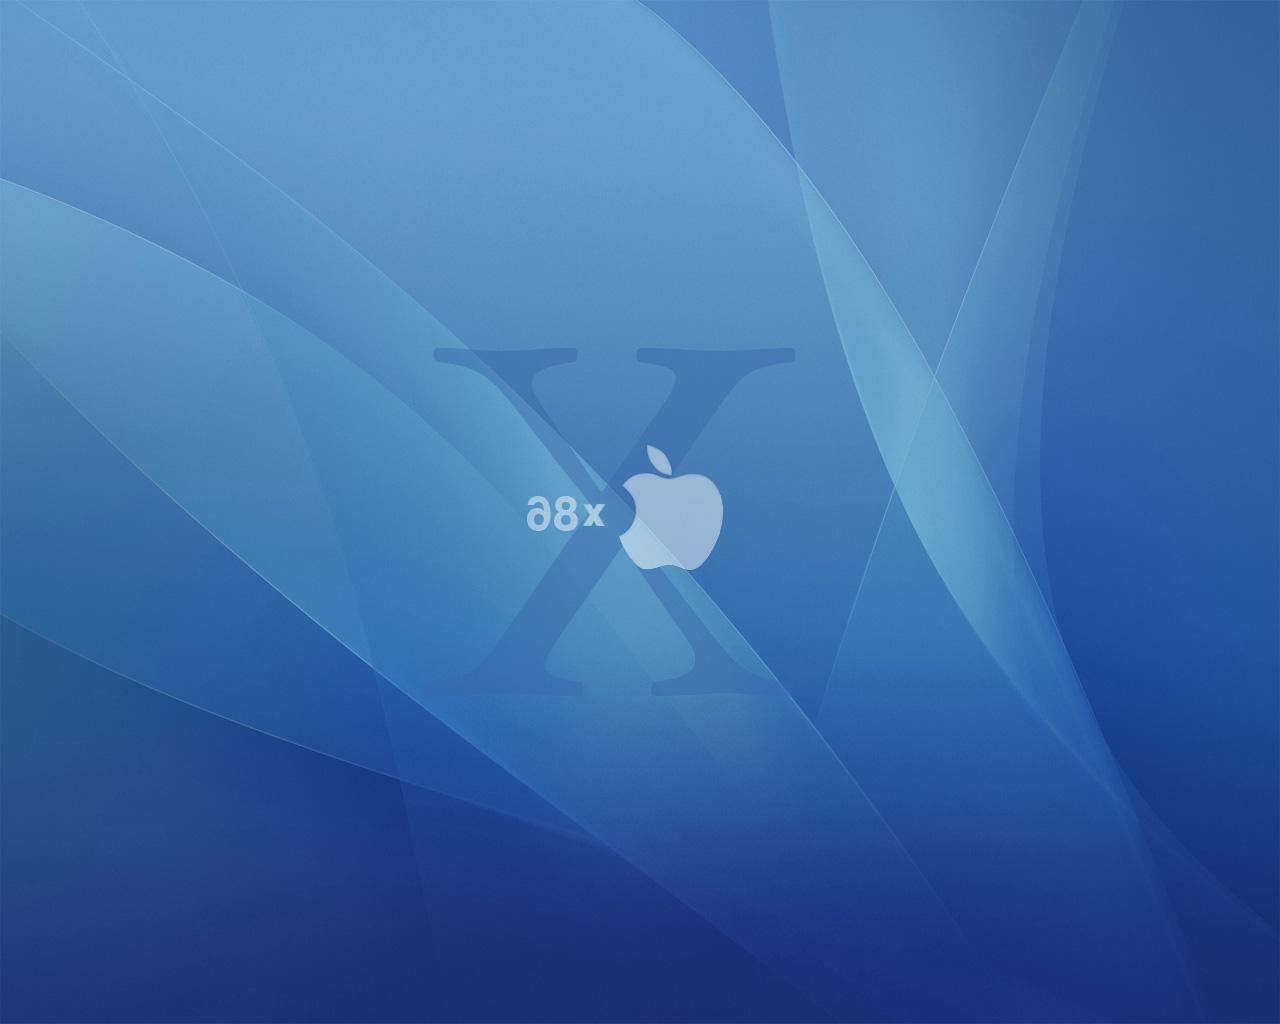 Mac OS X x86, Apple Aqua Blue